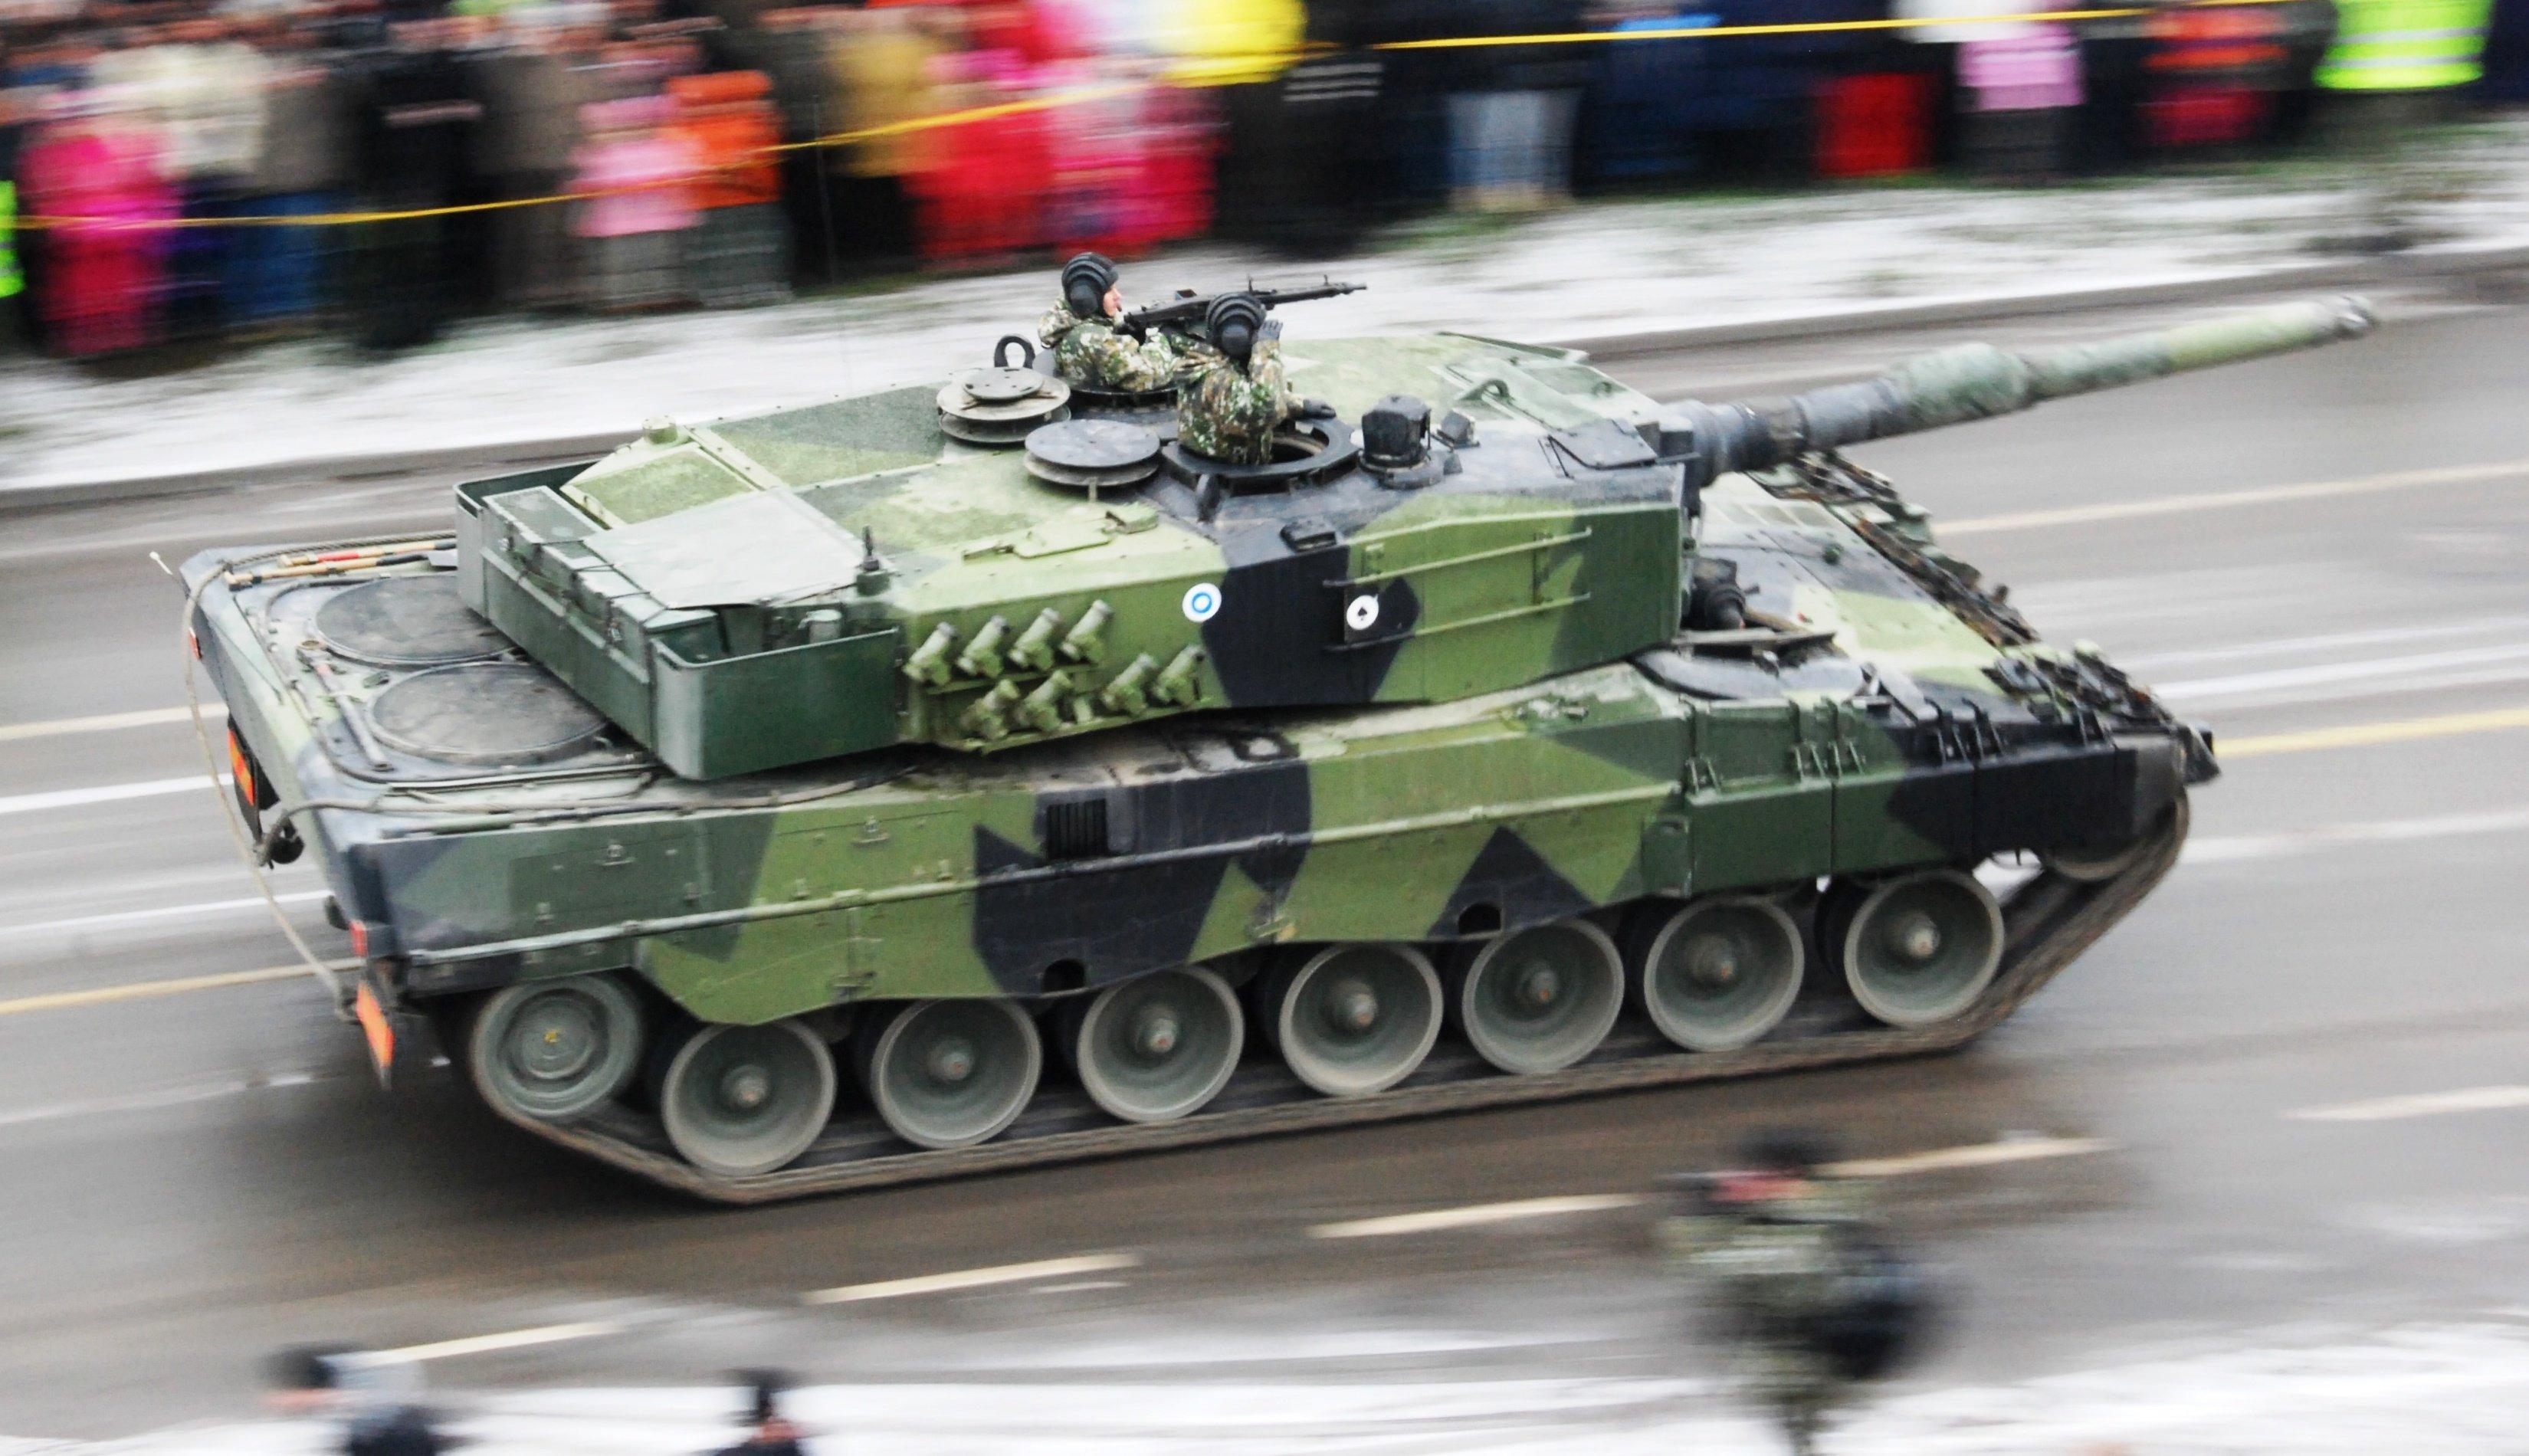 Finnish_Leopard_2.jpg